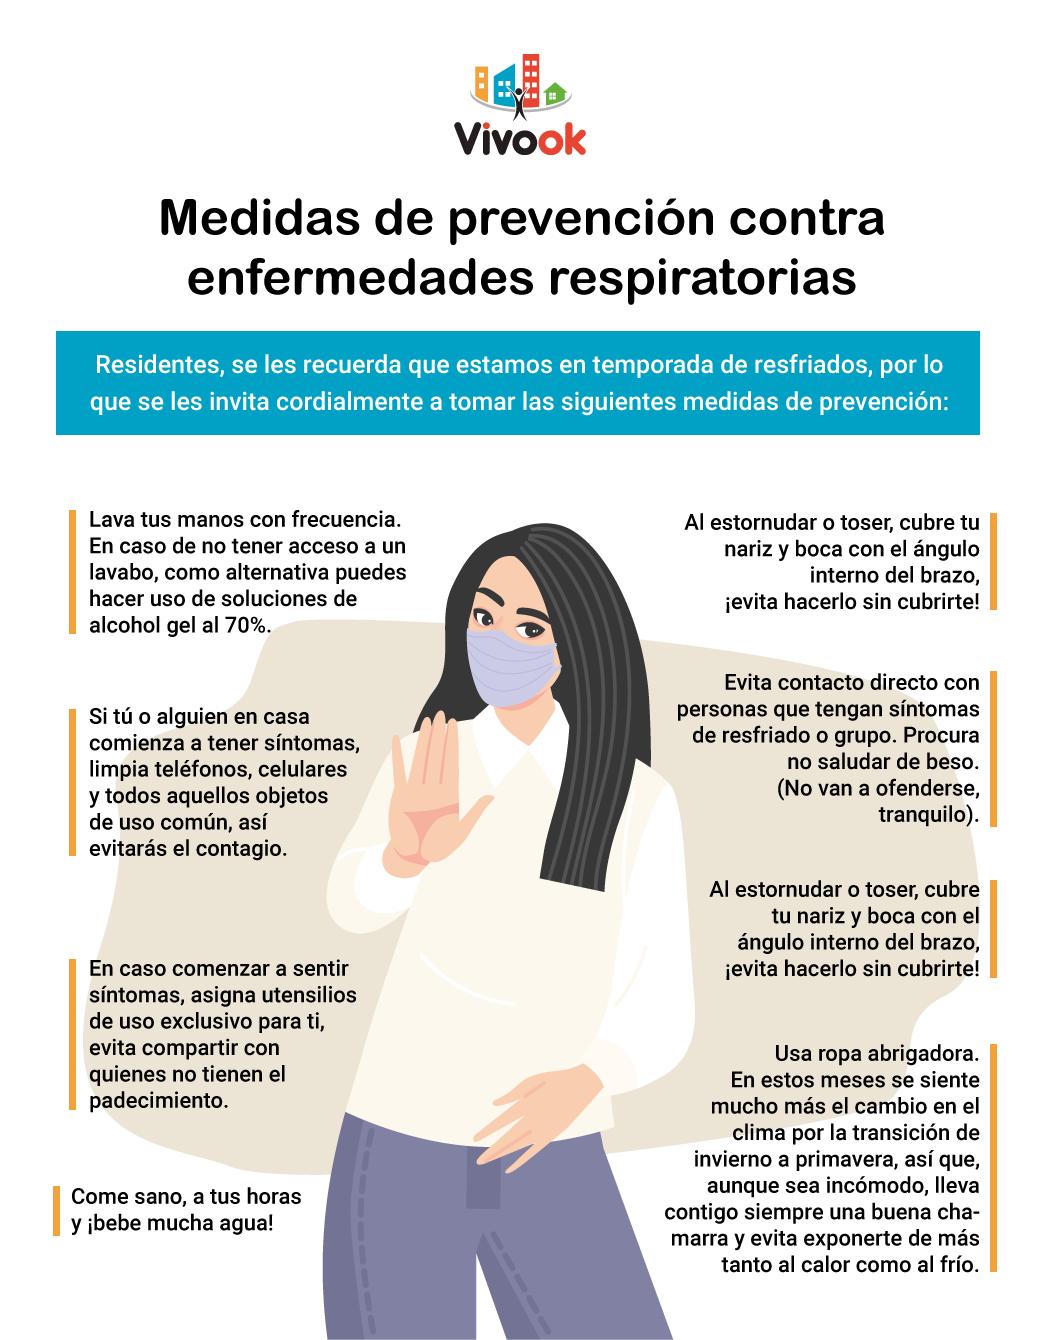 evita enfermedades respiratorias en tu condominio